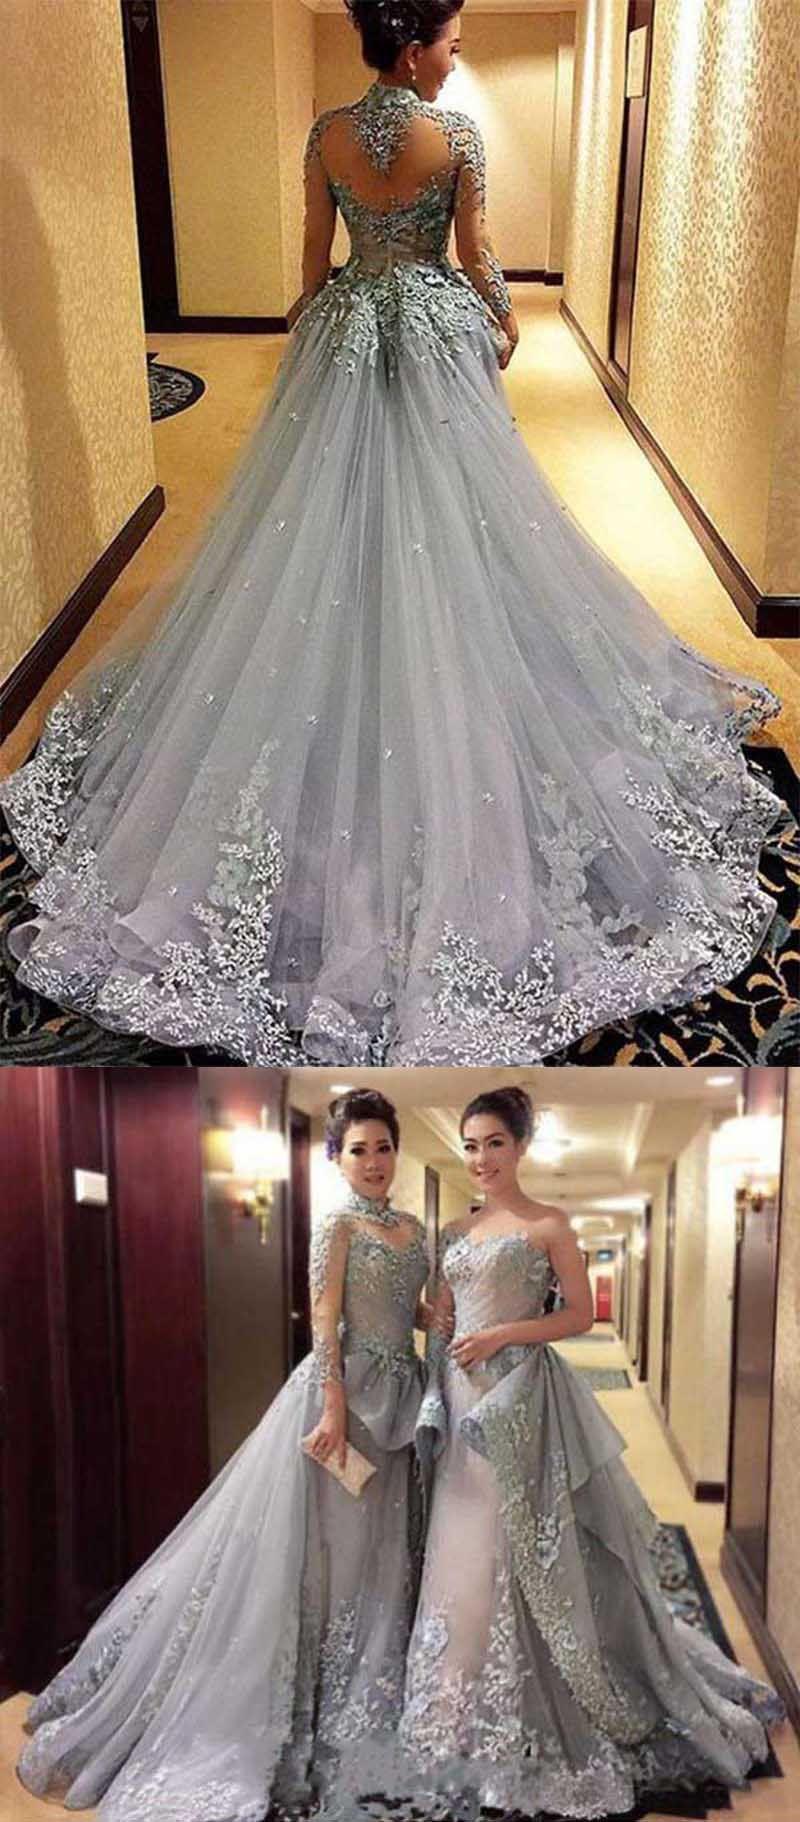 Ball gown wedding dresse princess wedding dresses long sleeves